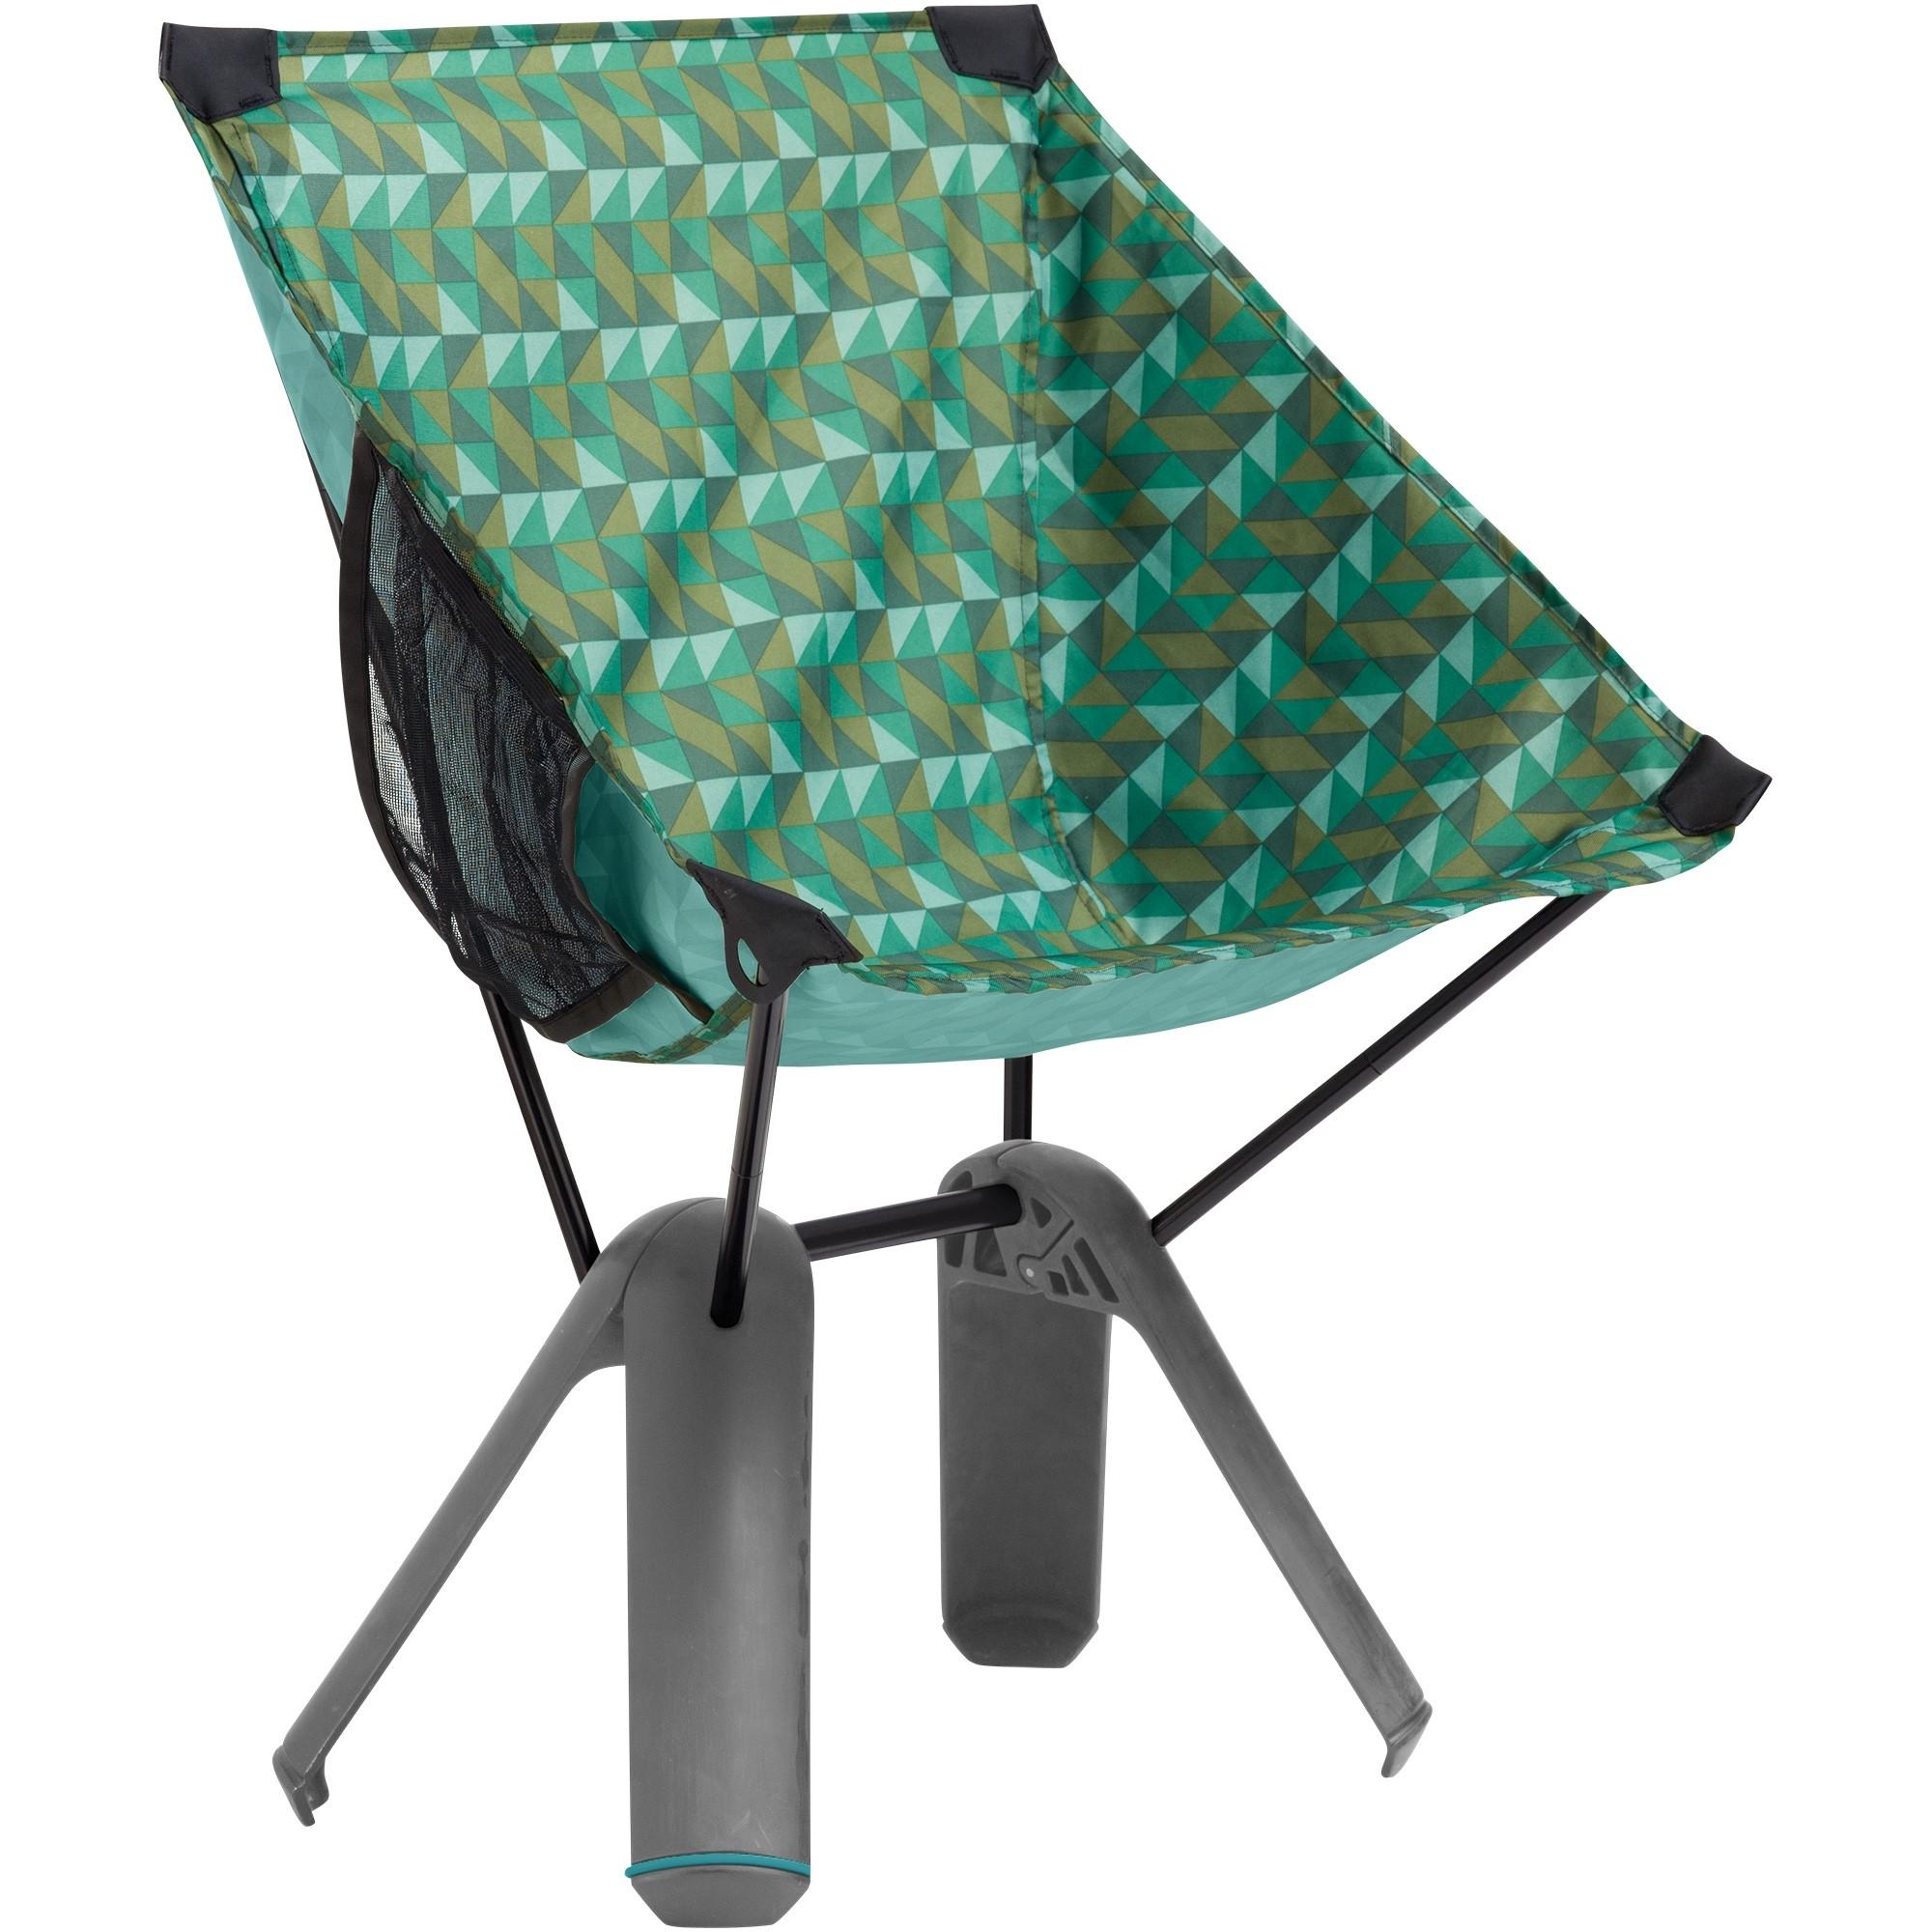 Therm-a-Rest Quadra Camping Chair - Cilantro Print